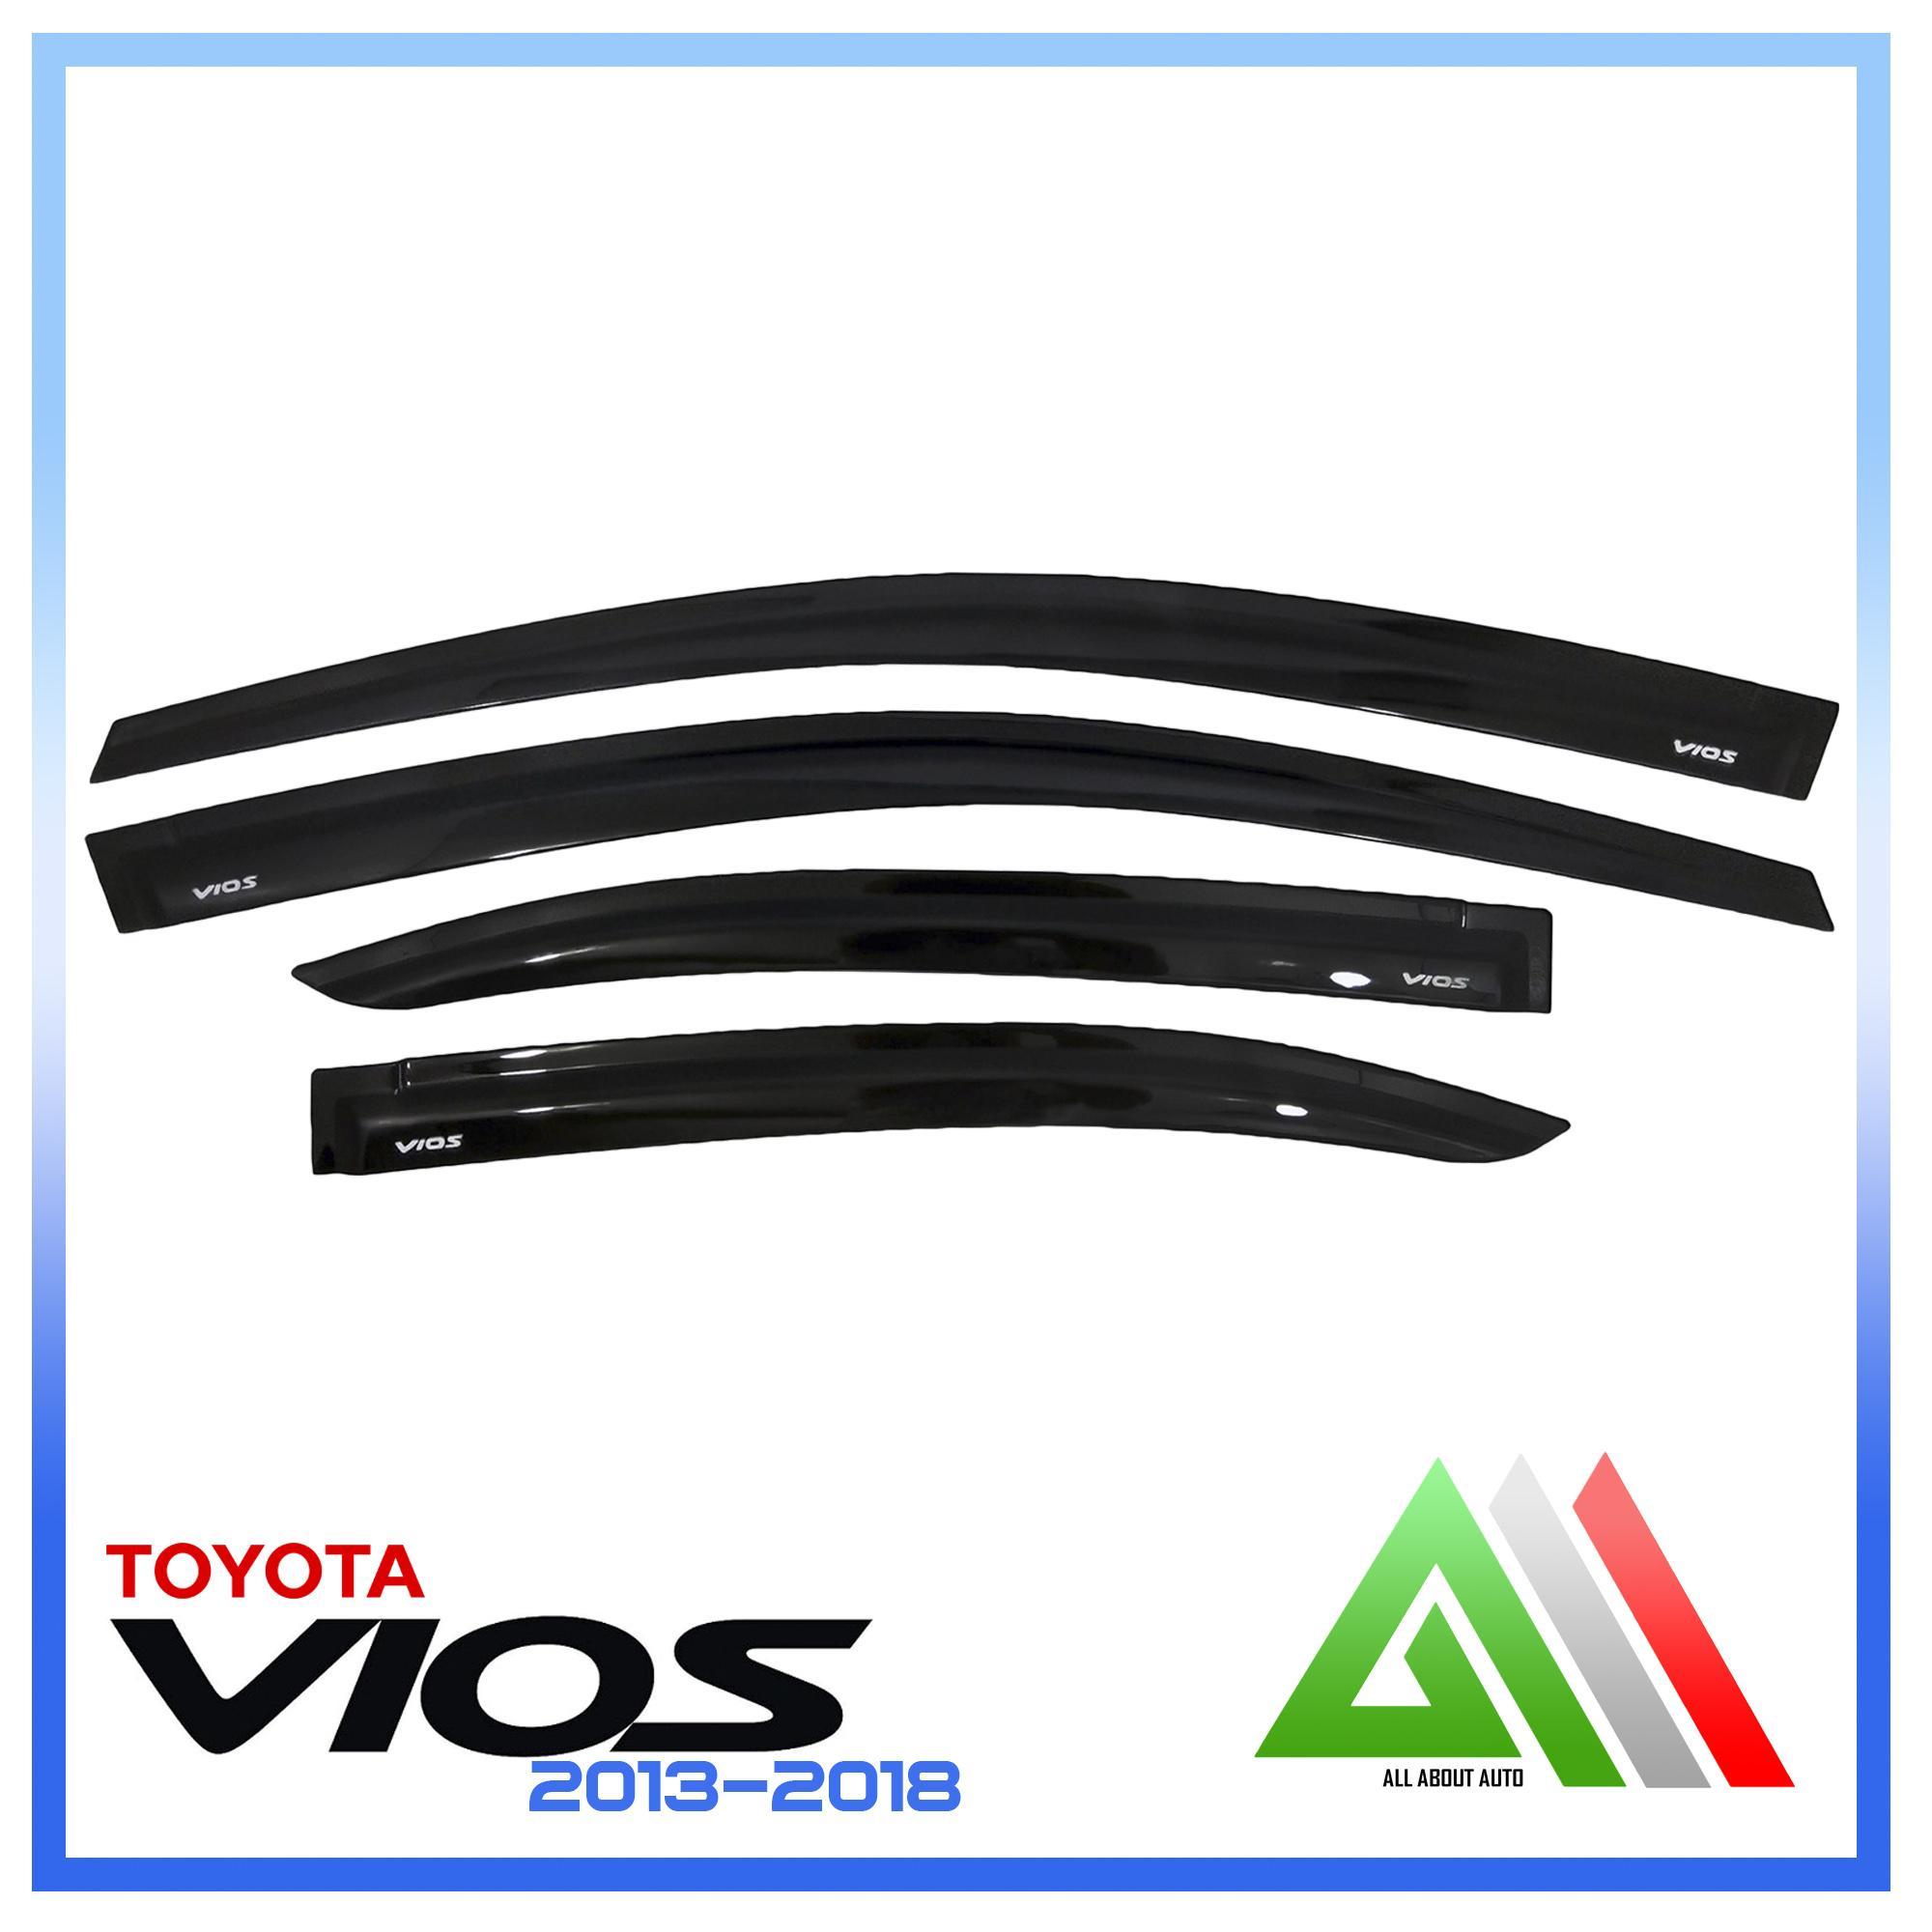 Car Shades For Sale Sun Shade Online Brands Prices Reviews 1995 Explorer Radio Wiring Behind Dash Toyota Vios 2018 Oem Type Rain Guard Window Visor Made In Thailand